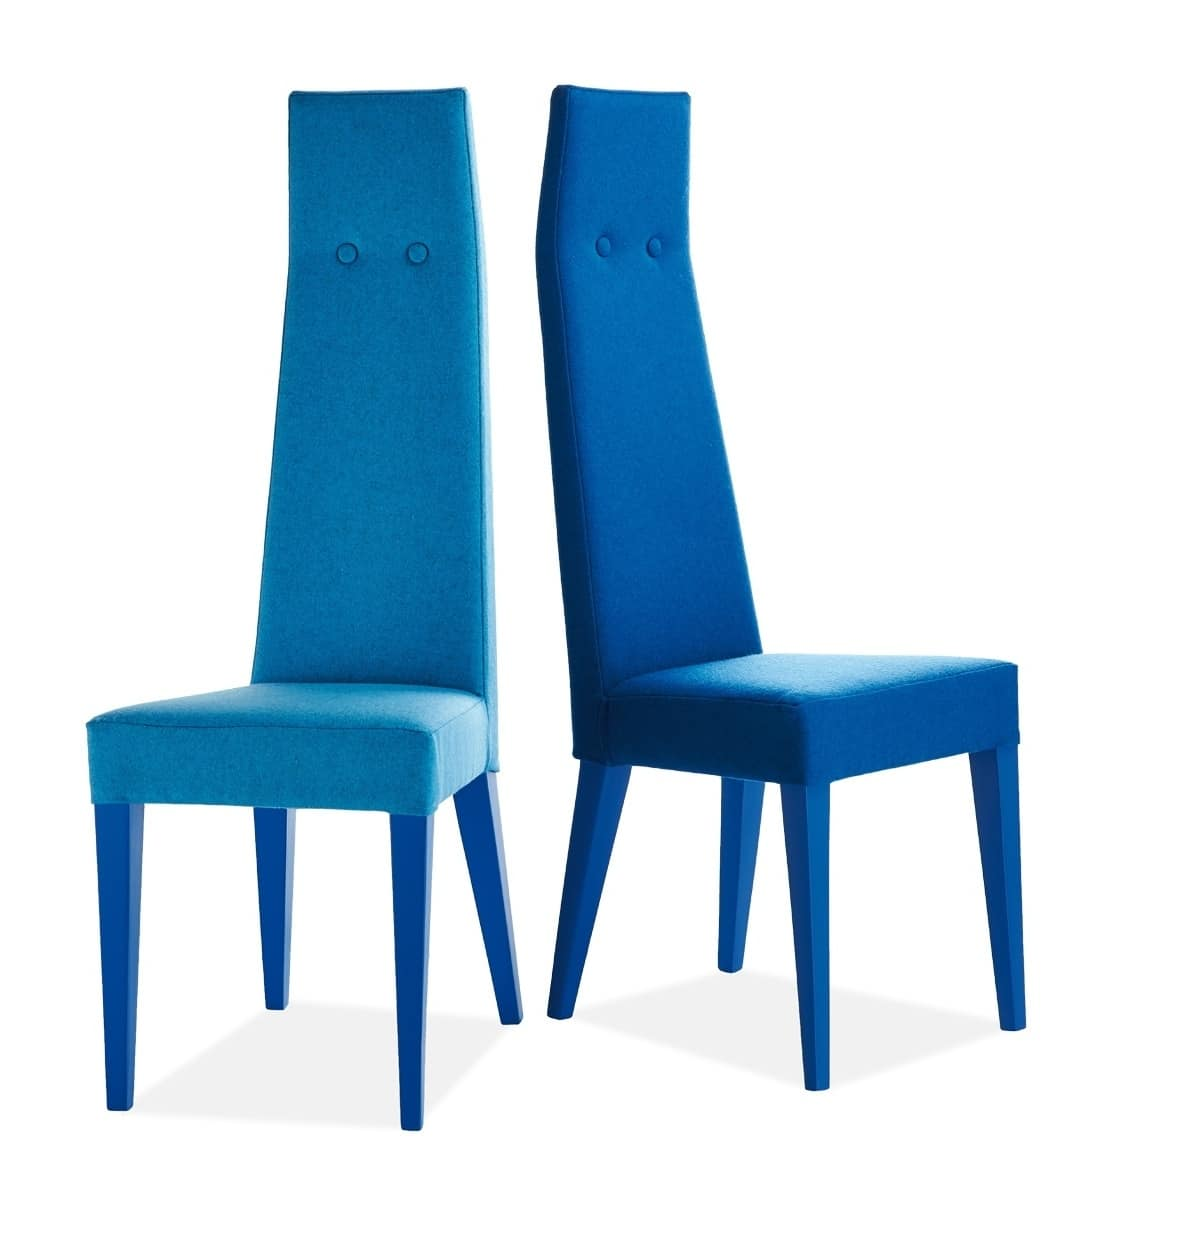 Sedia imbottita con schienale alto | IDFdesign